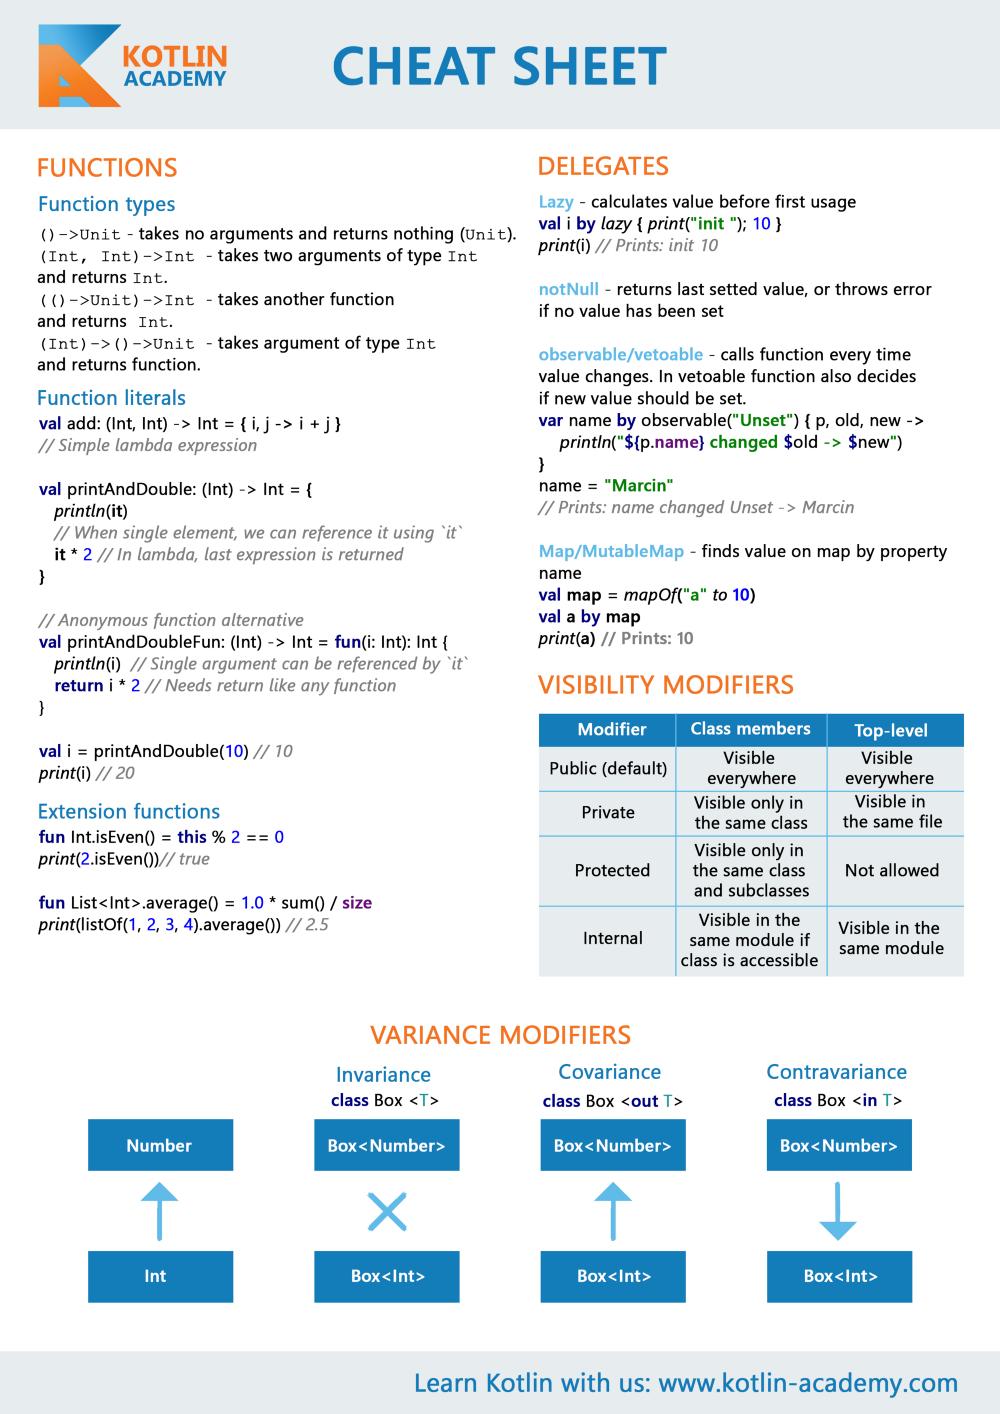 11 C Sharp Programming Ideas C Sharp Programming Computer Programming Computer Science